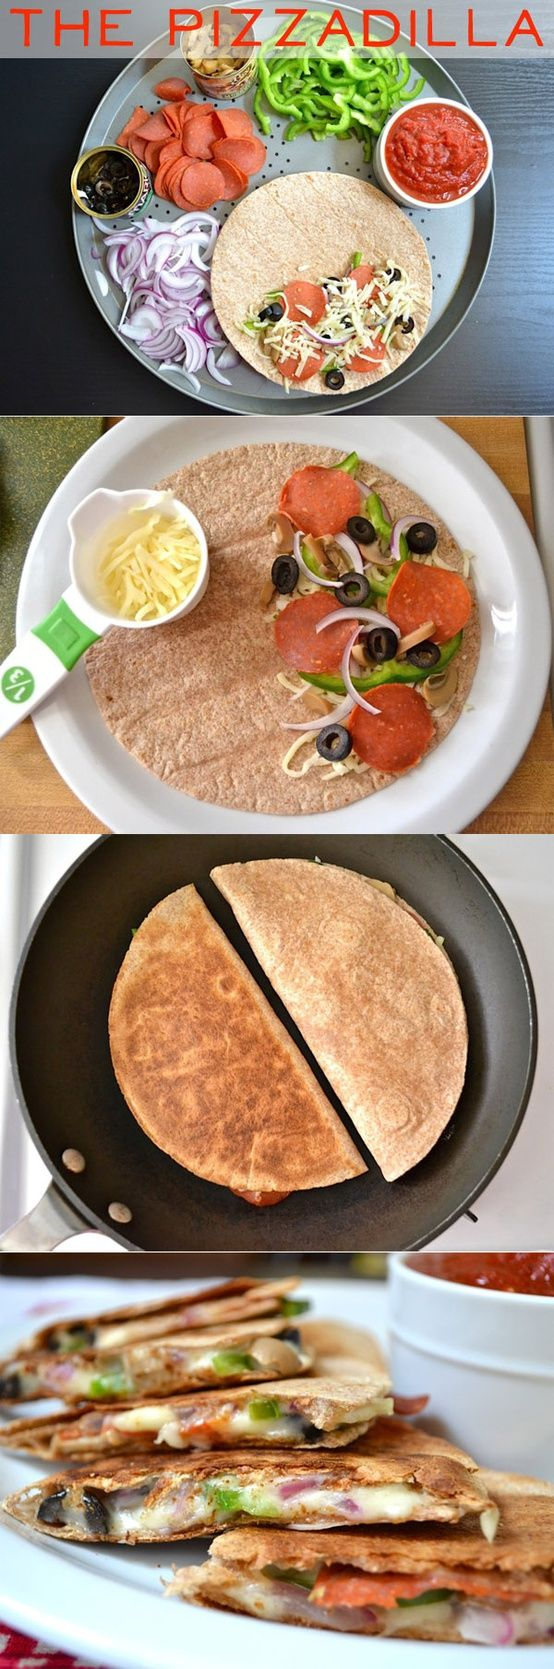 Pizzadillas - healthier pizza option